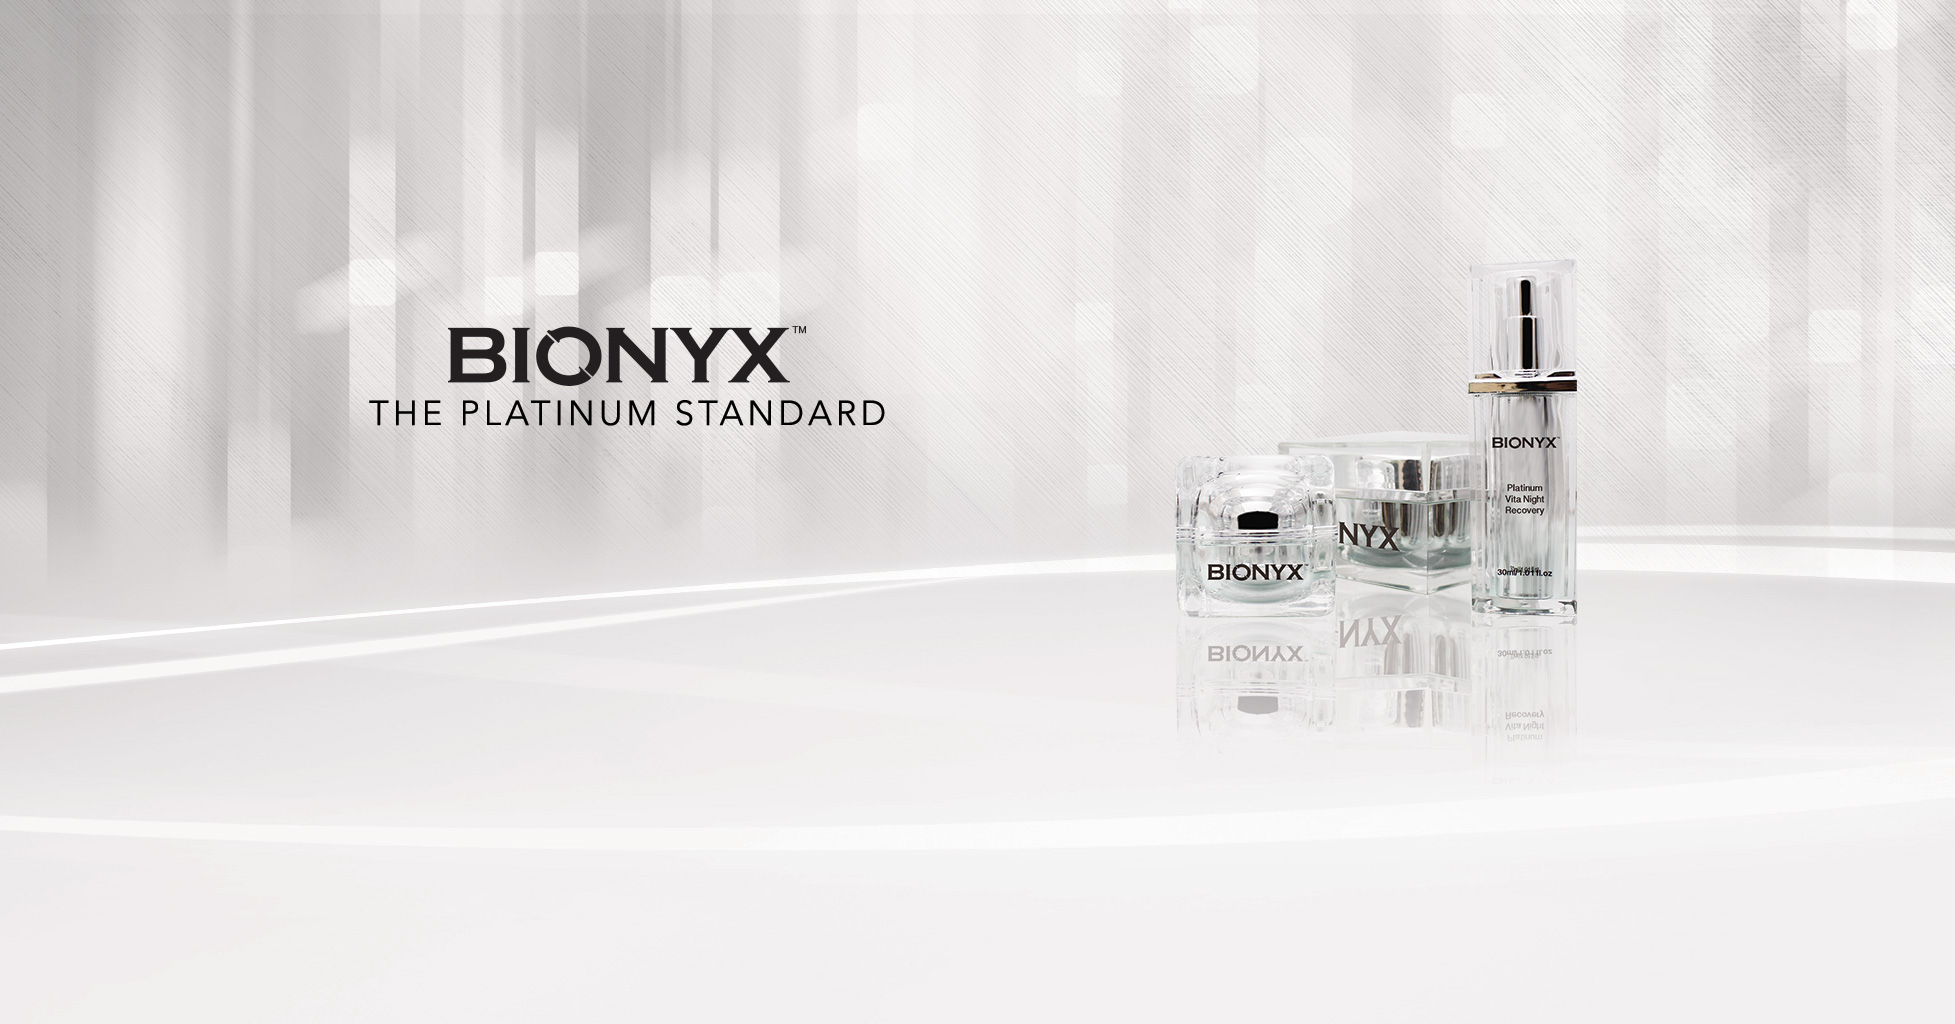 Bionyx – The Platinum Standard